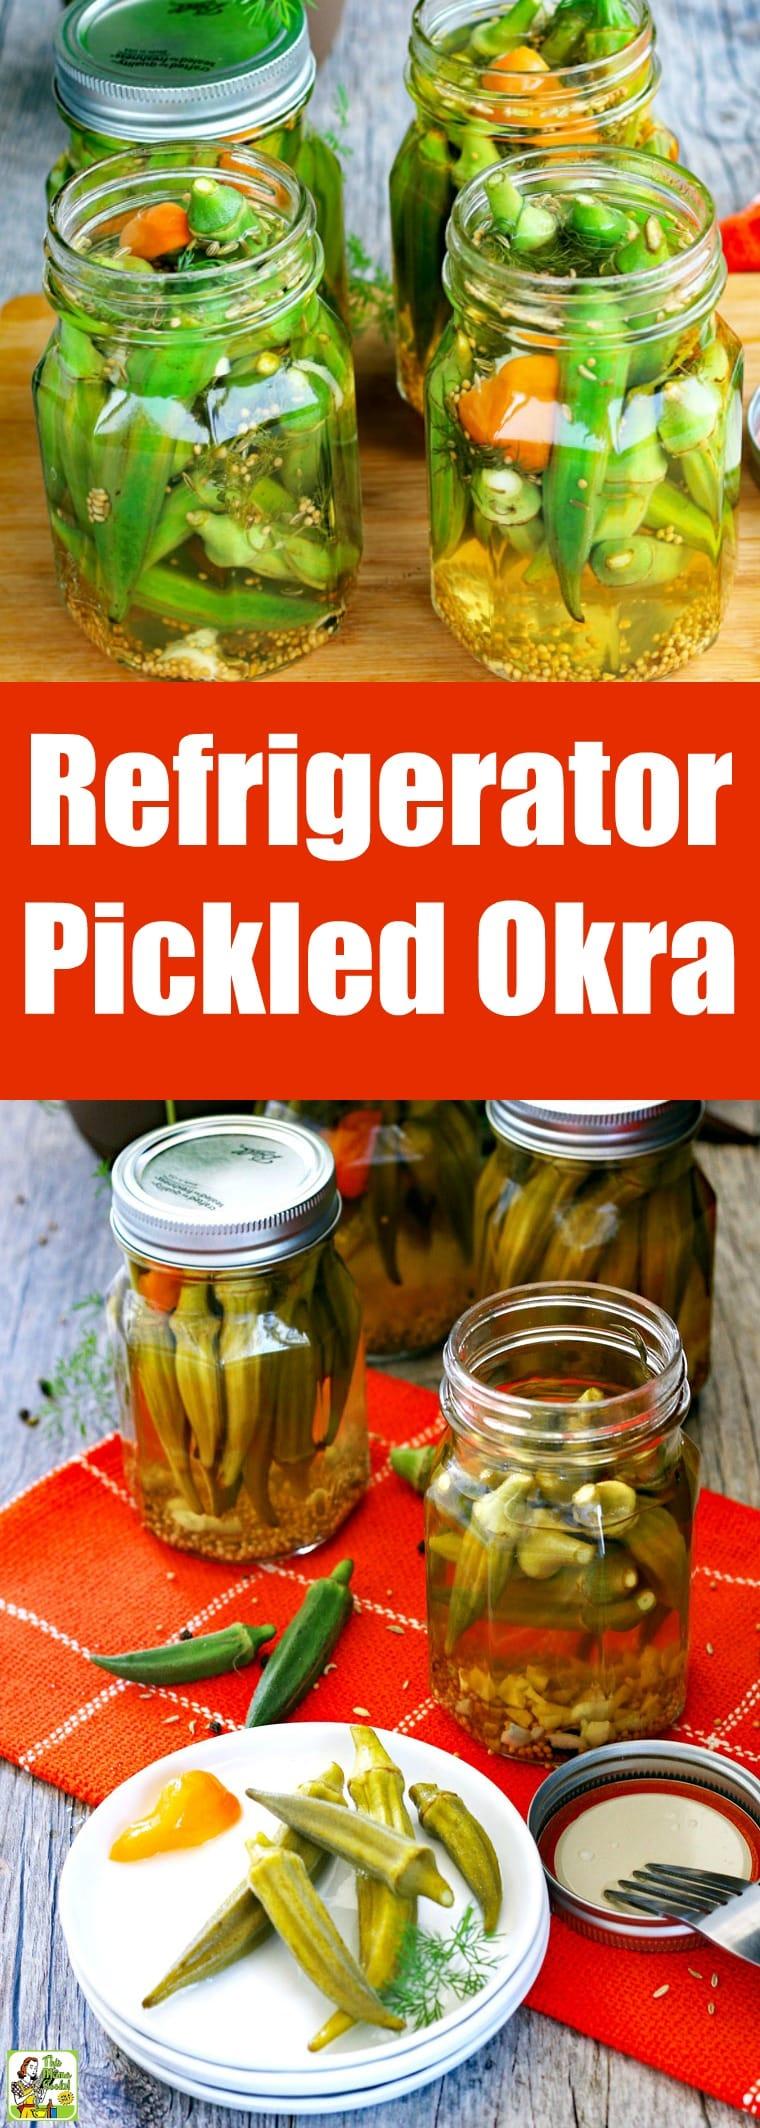 Refrigerator Pickled Okra Recipe